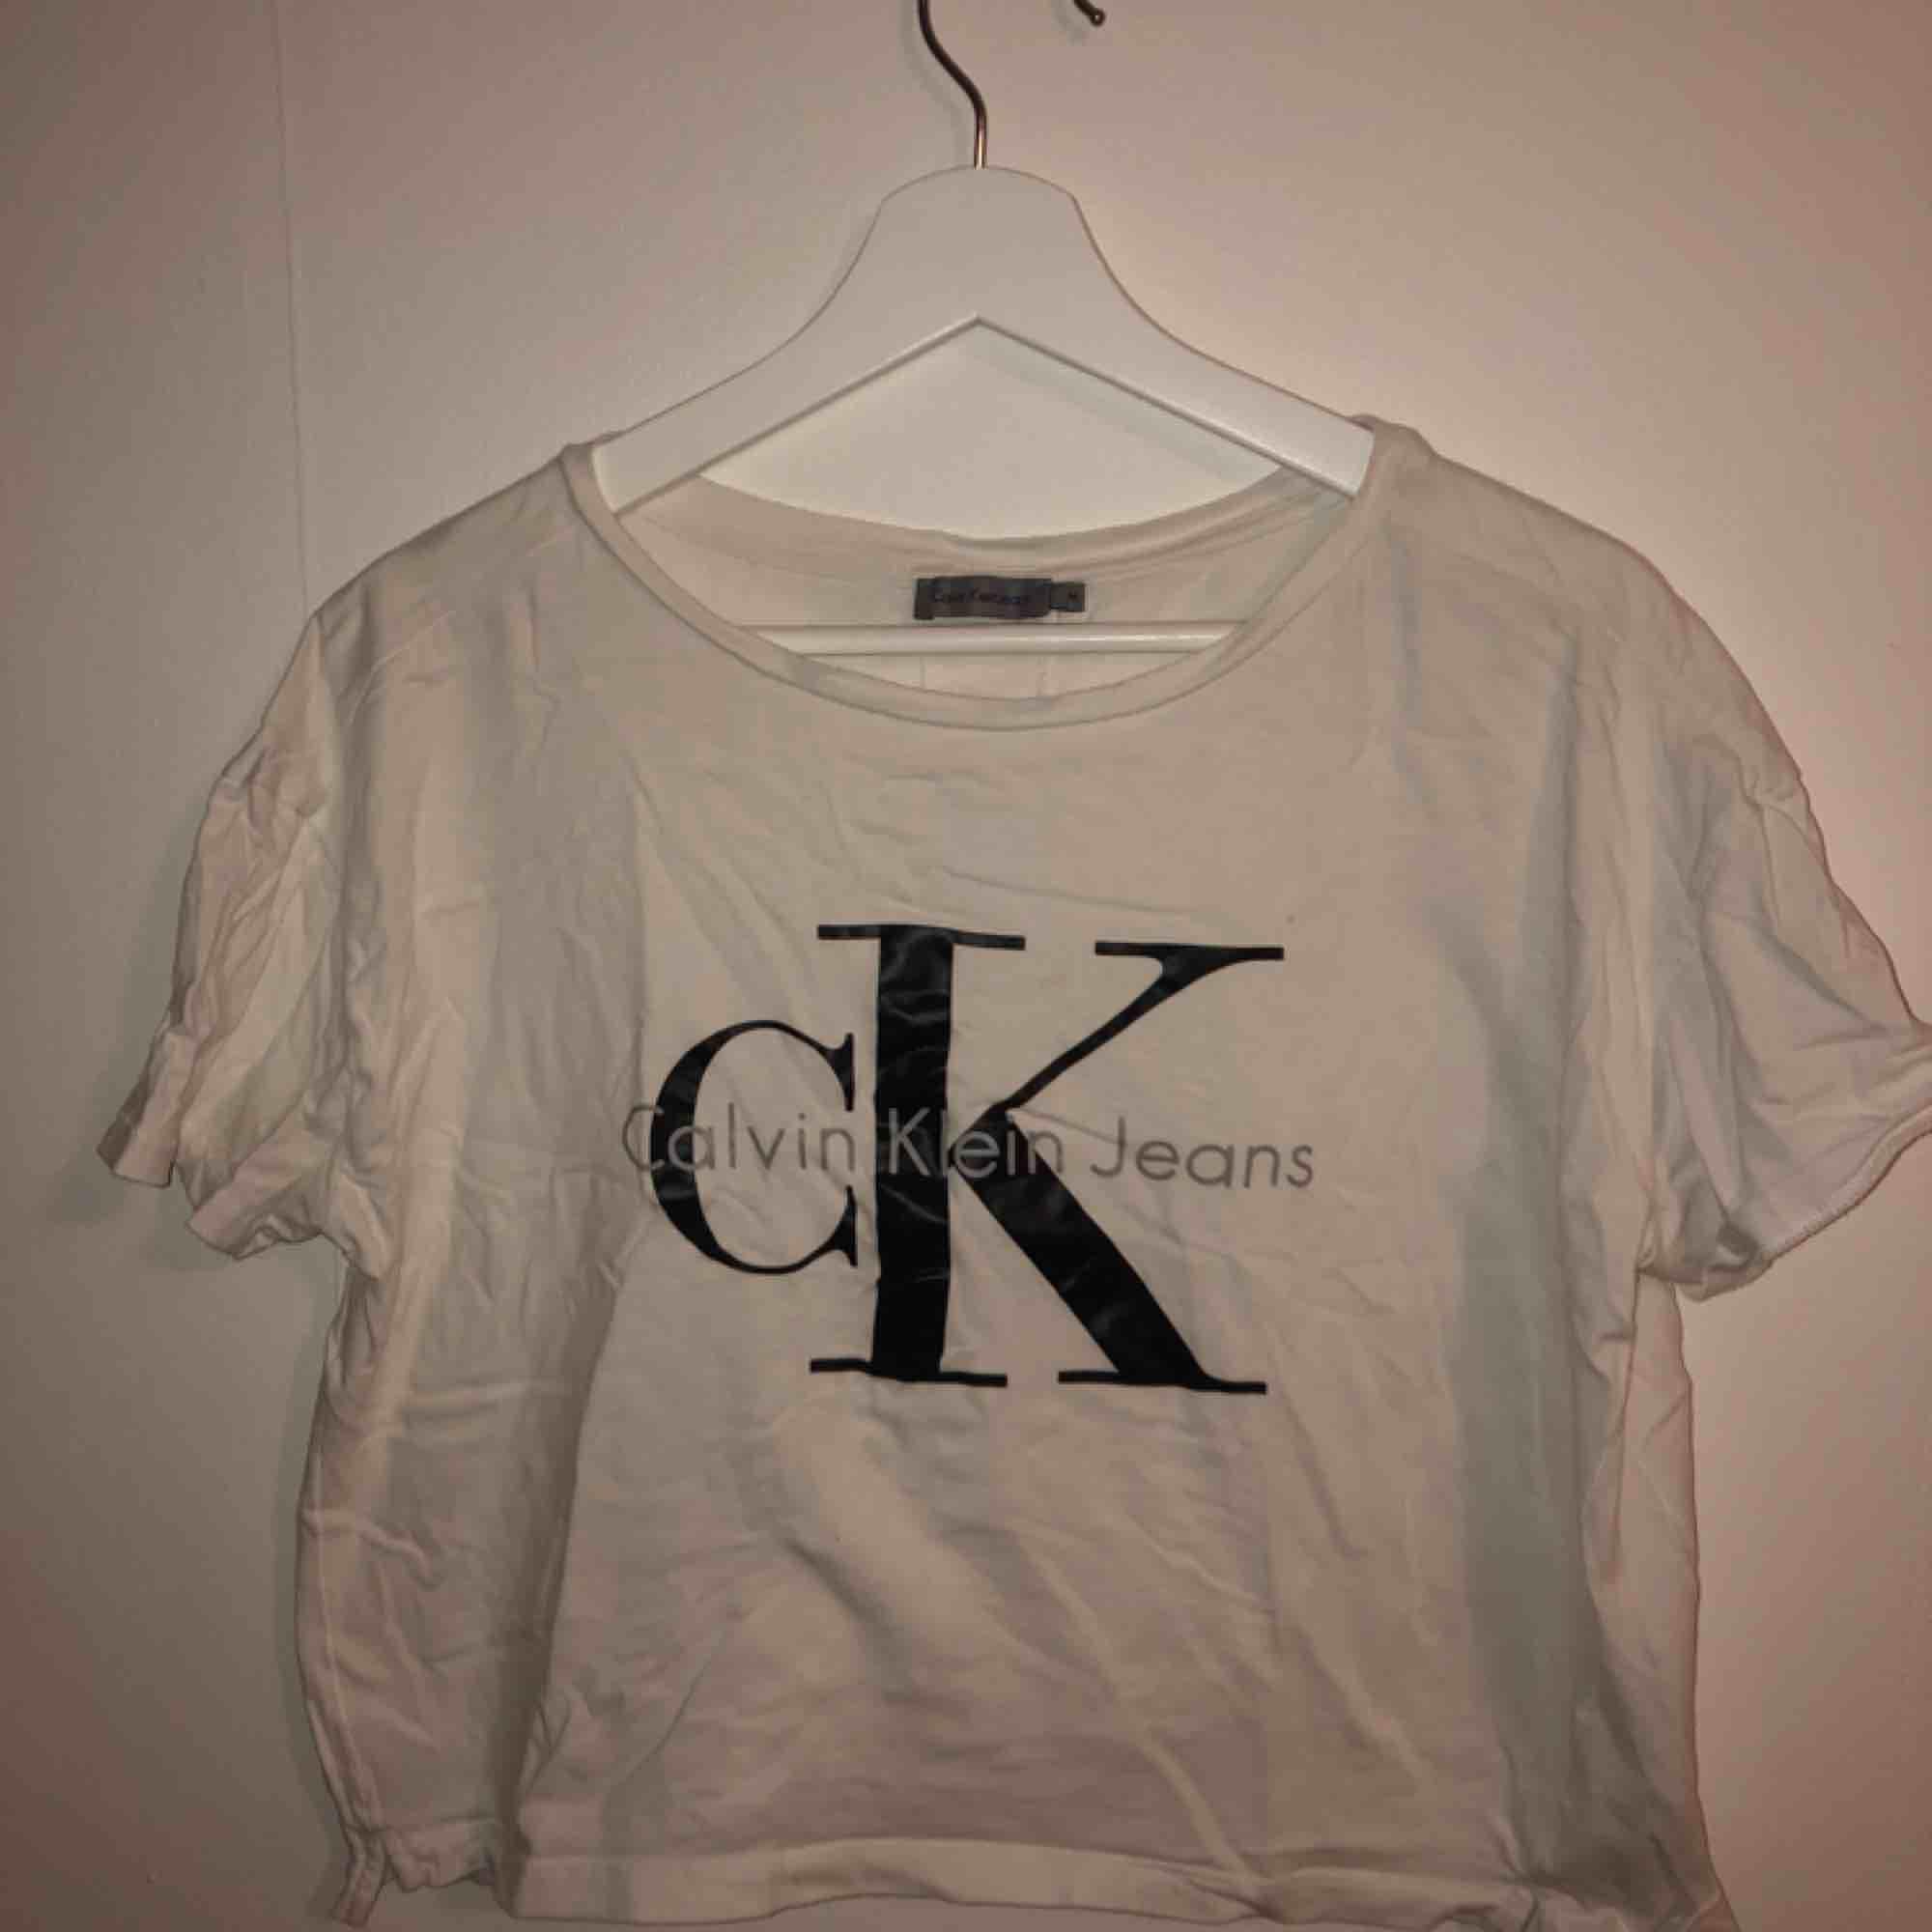 Snygg kortare t-shirt från Calvin Klein jeans.. T-shirts.